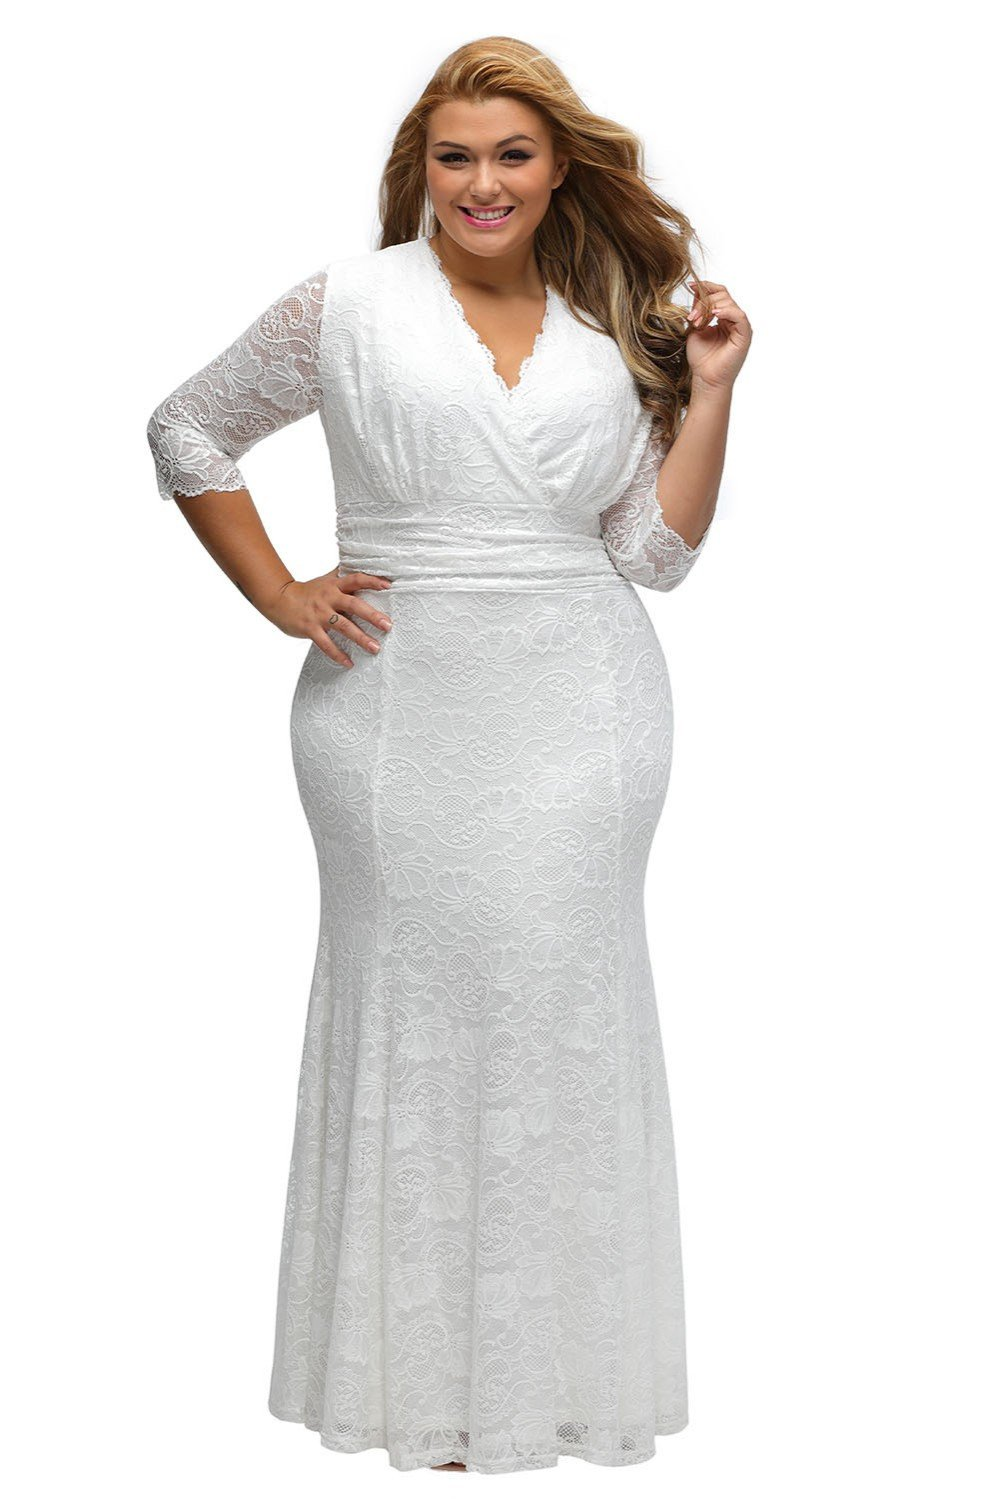 Plus size bling wedding dresses  Vneck Plus Size Lace Party Dress  Lace party dresses and Products